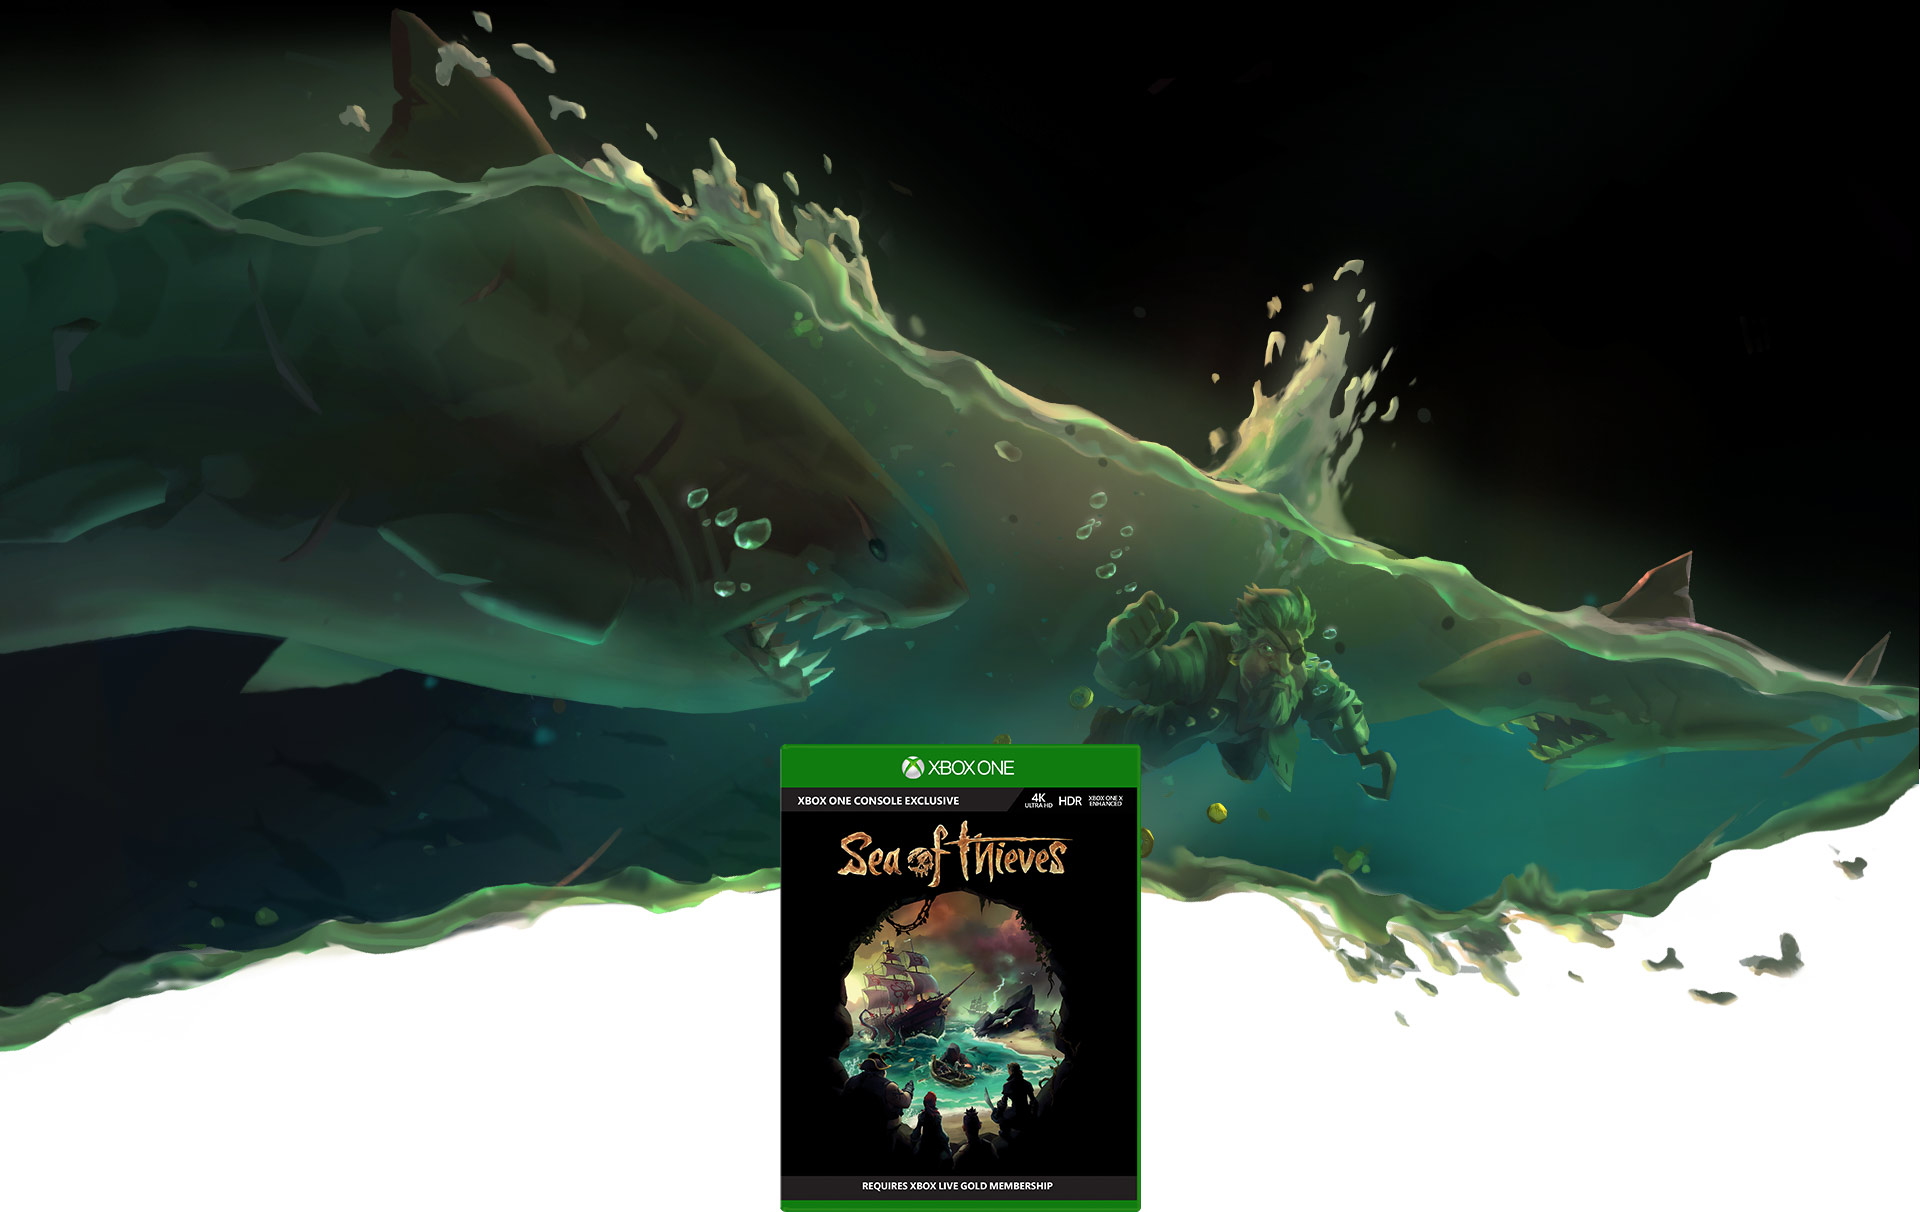 Underwater Monster Screensaver Crack